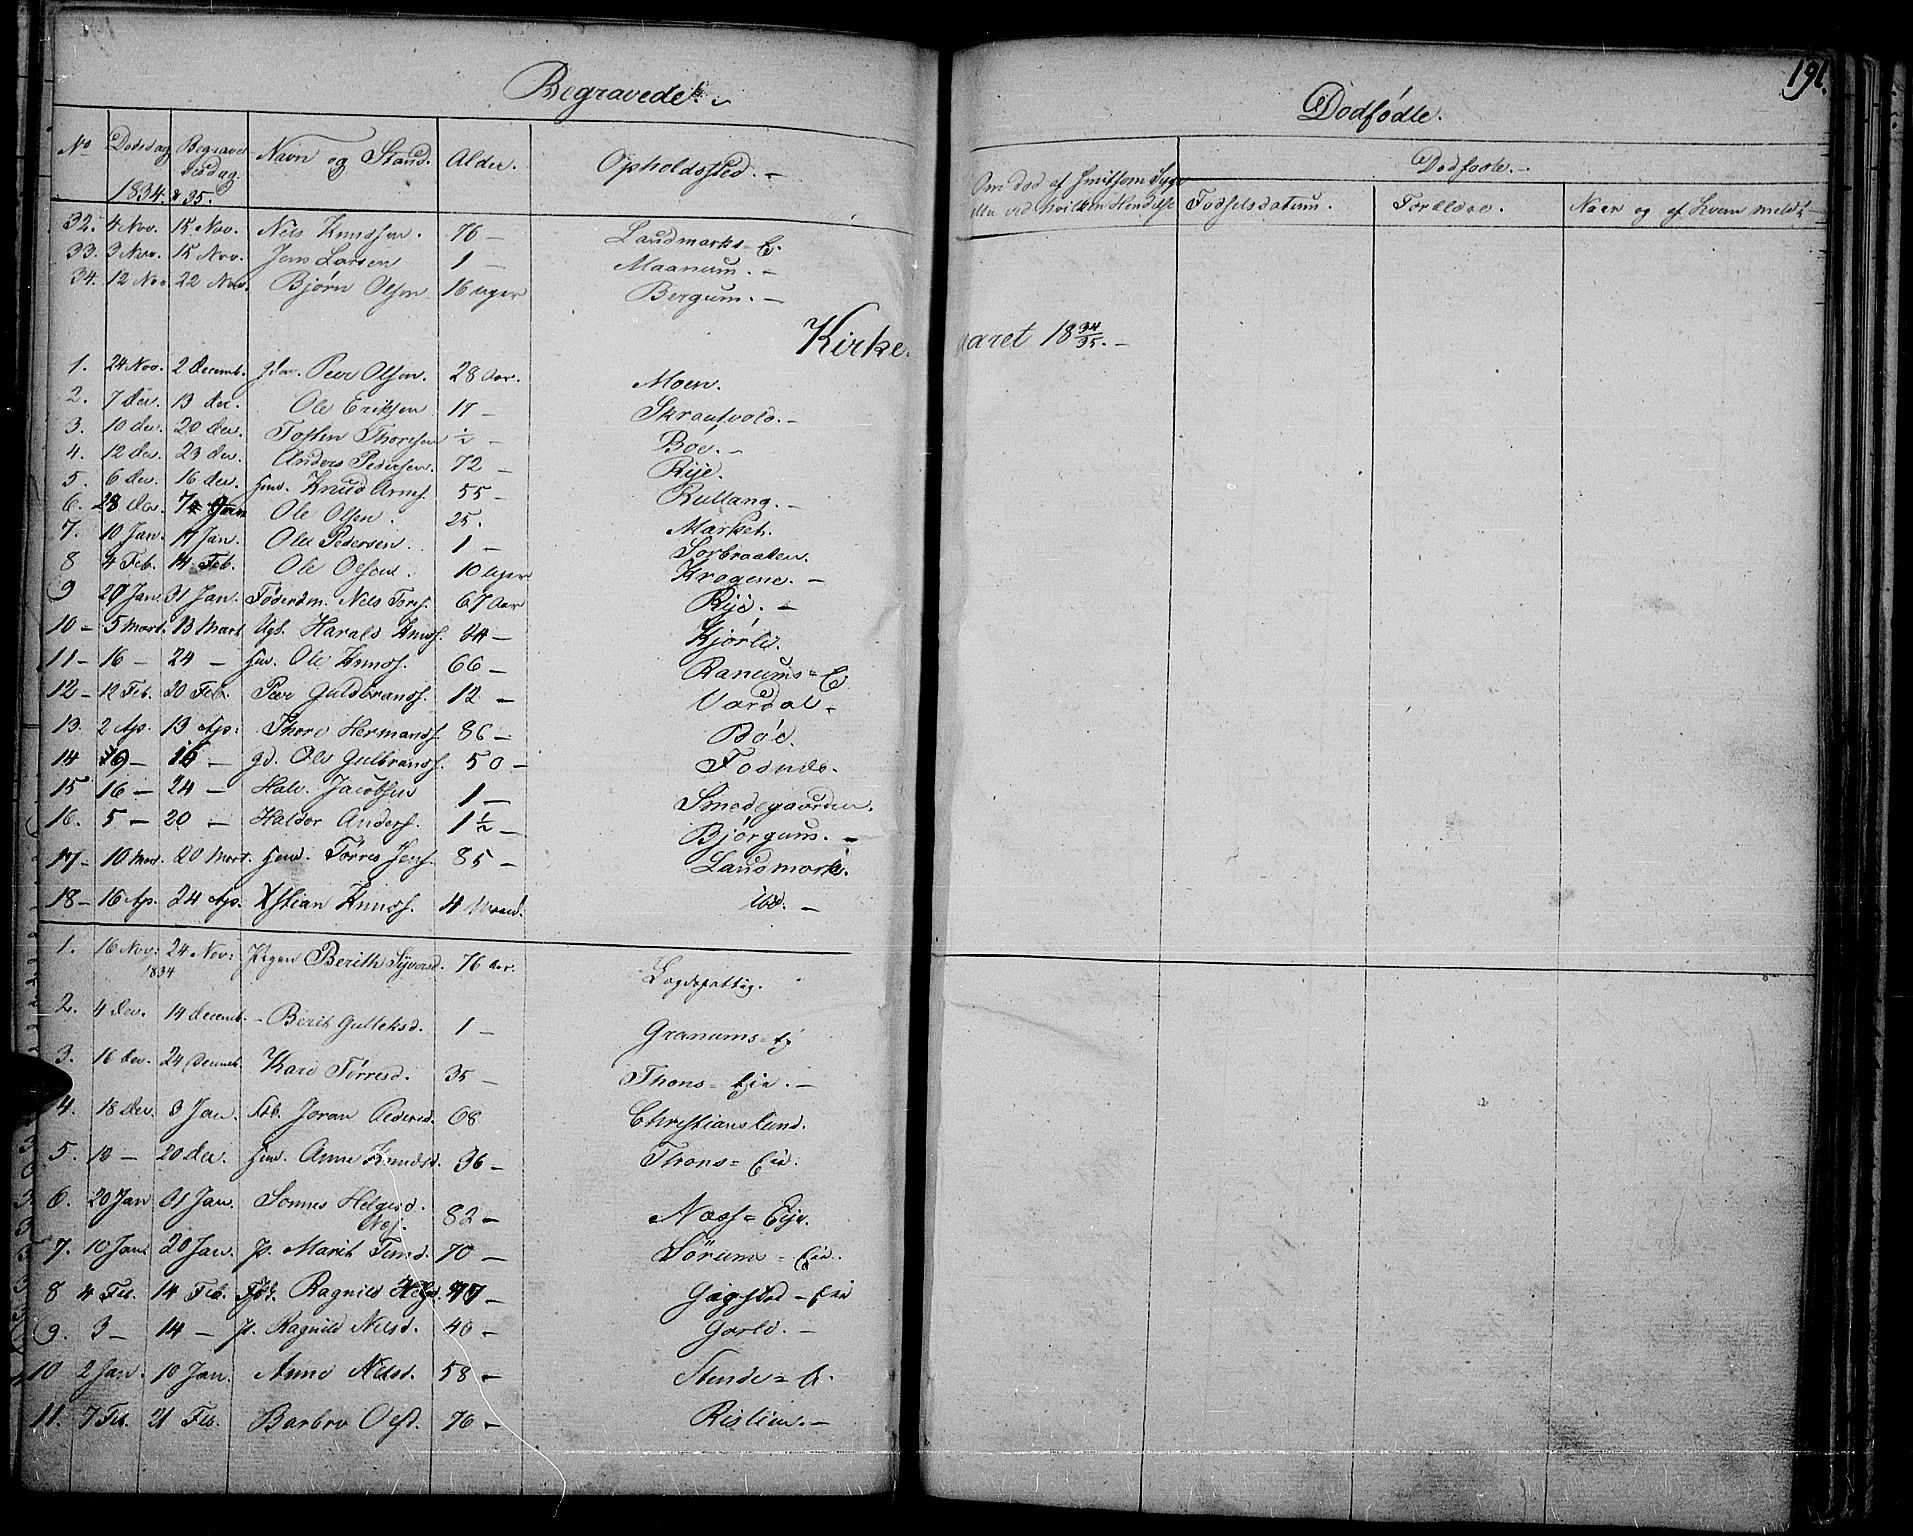 SAH, Nord-Aurdal prestekontor, Ministerialbok nr. 3, 1828-1841, s. 191